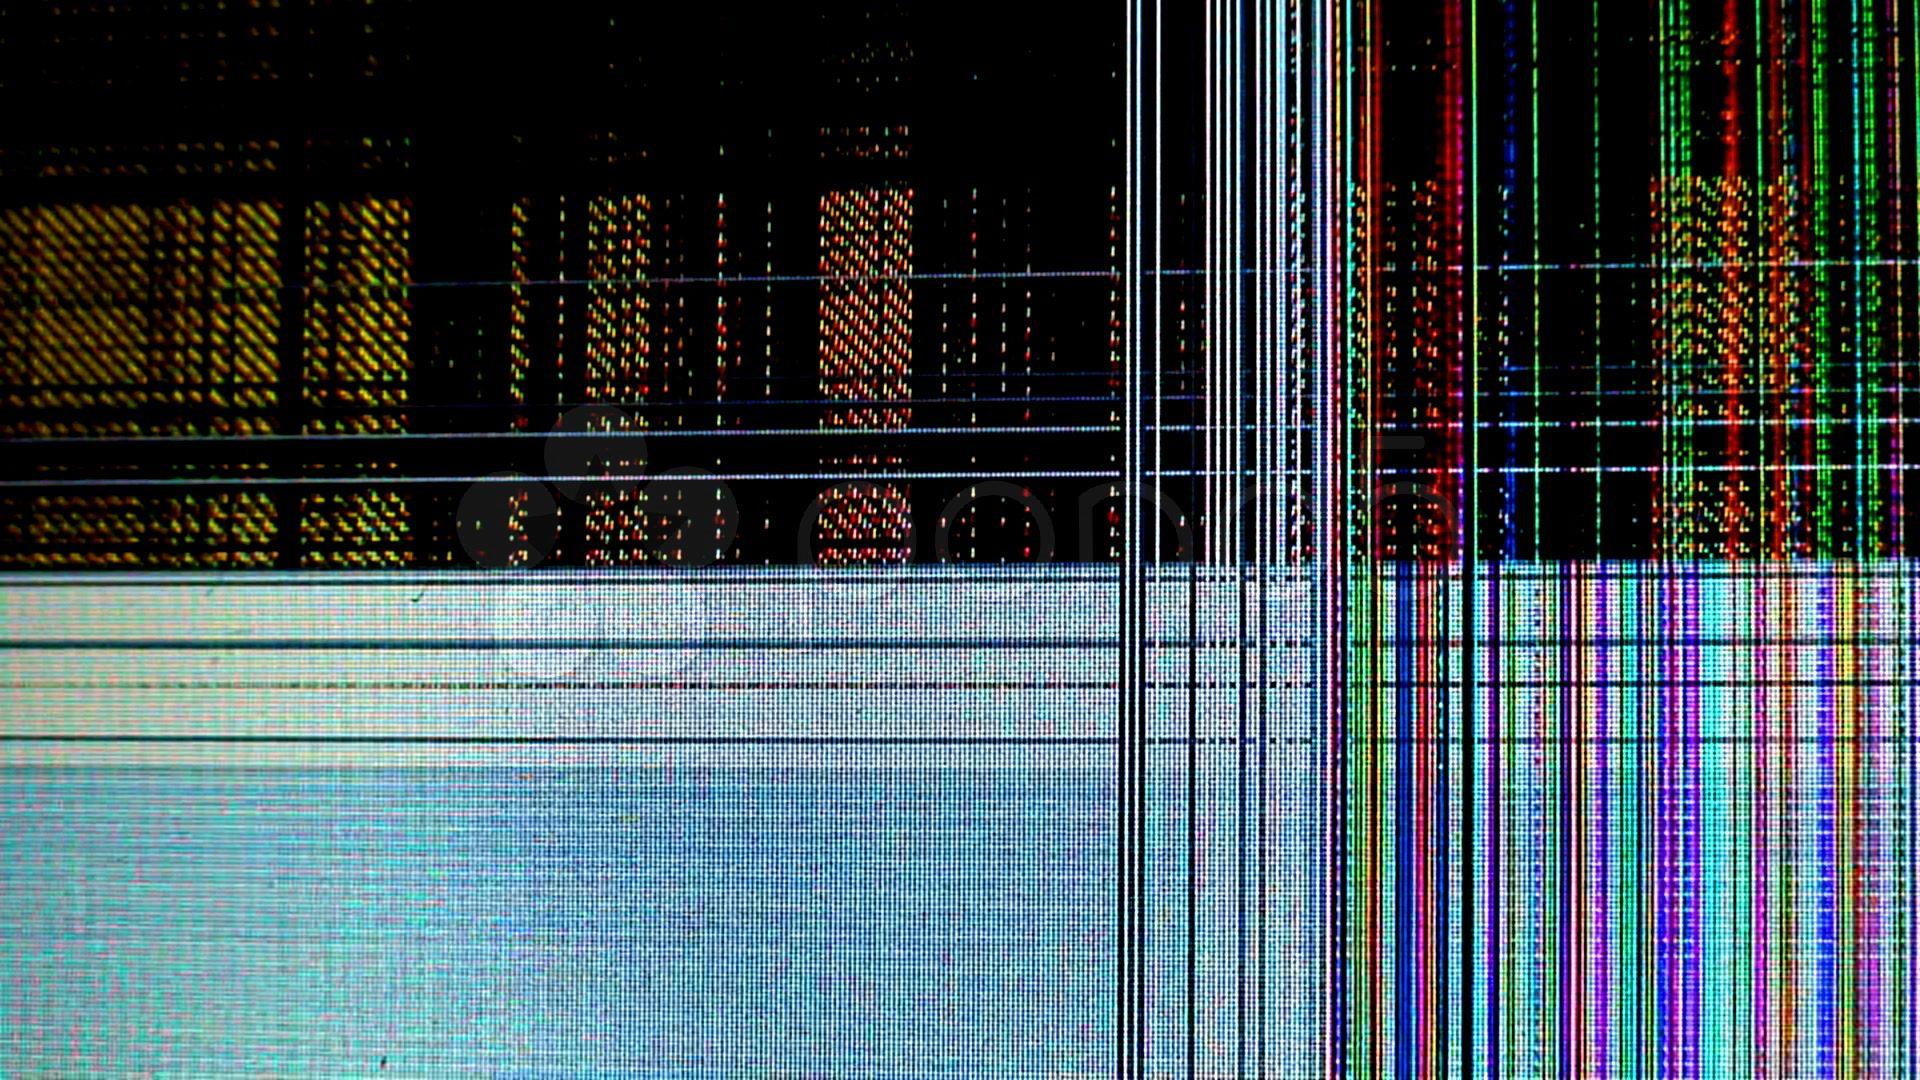 Broken Lcd Screen Wallpaper For Android jvH Screen